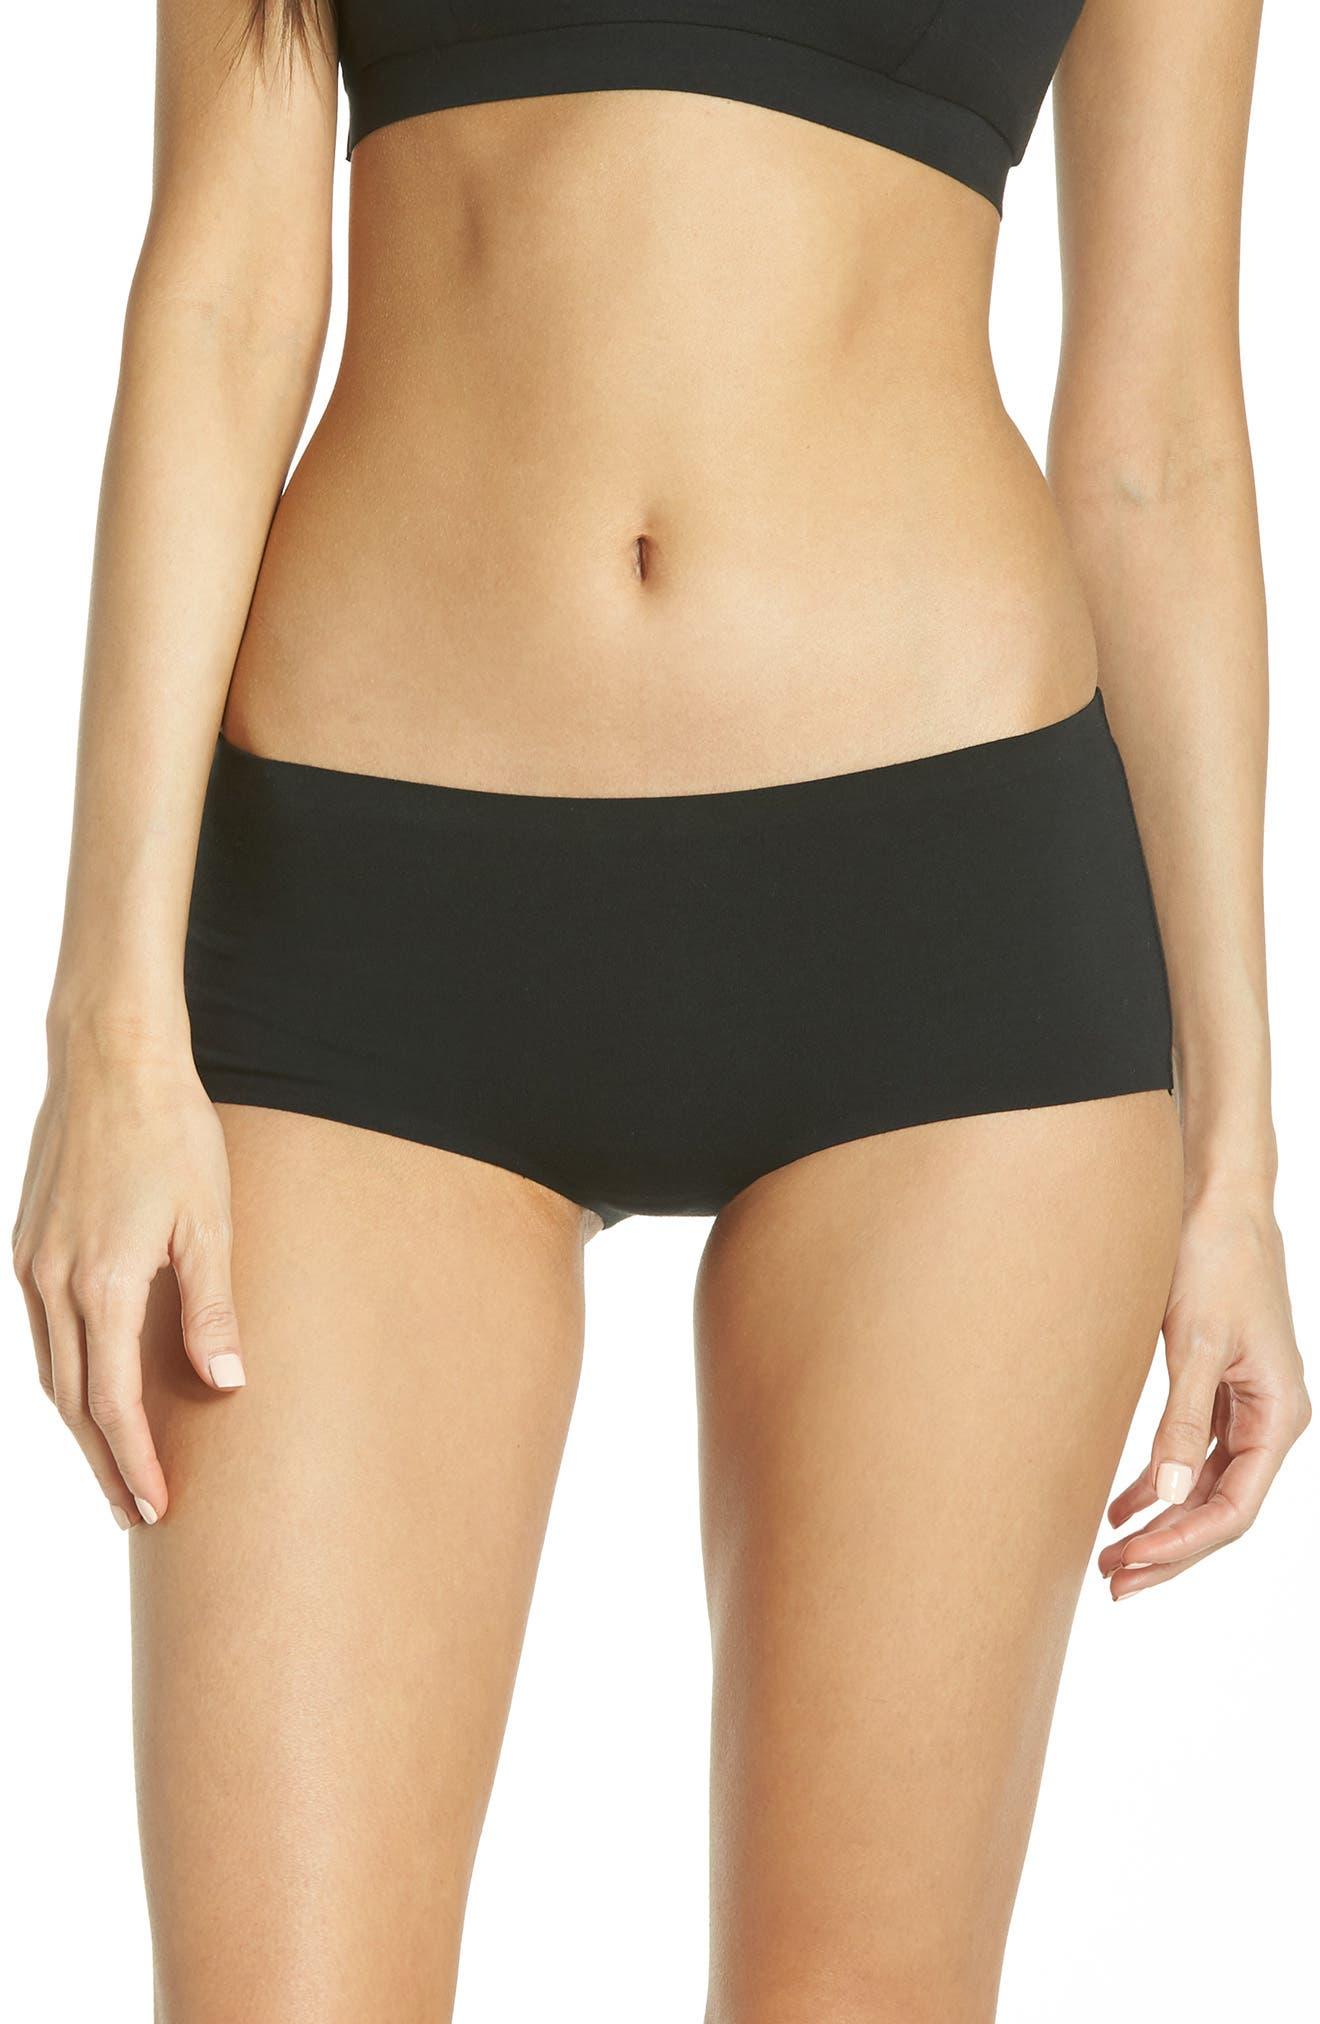 HONEYDEW INTIMATES Shay Hipster Panties, Main, color, BLACK